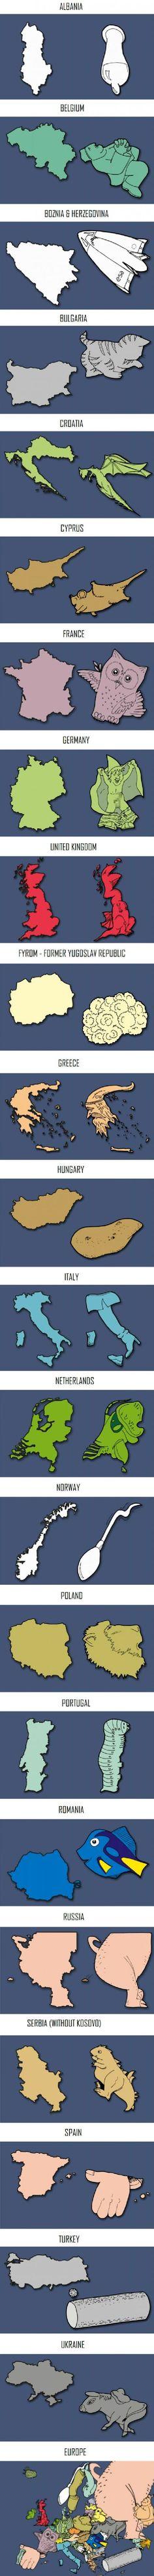 Creative Countries of Europe